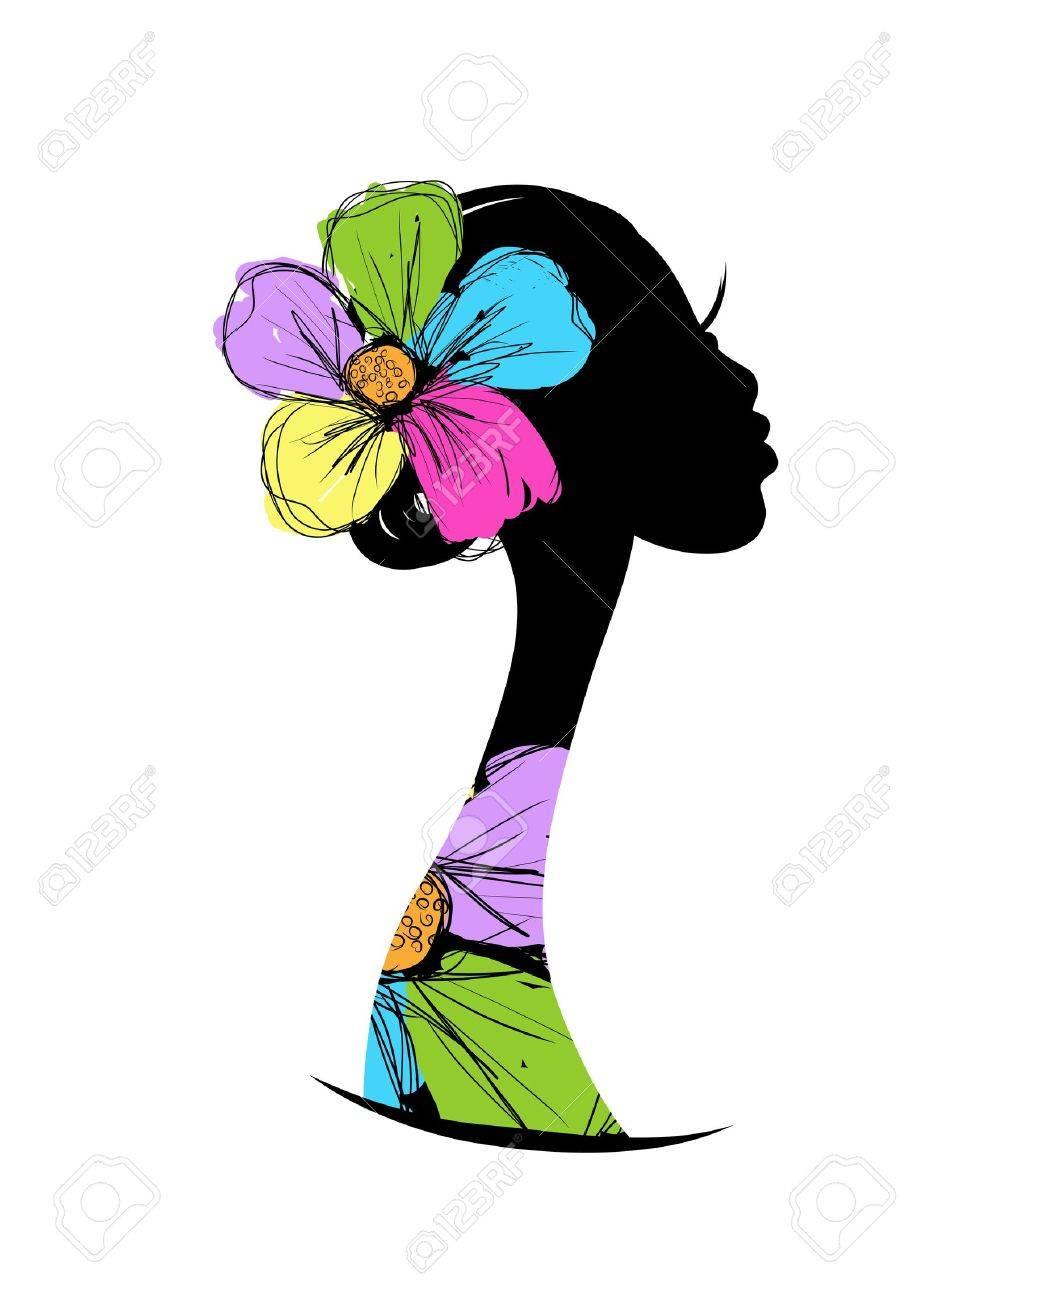 Female head silhouette for your design - 20925979